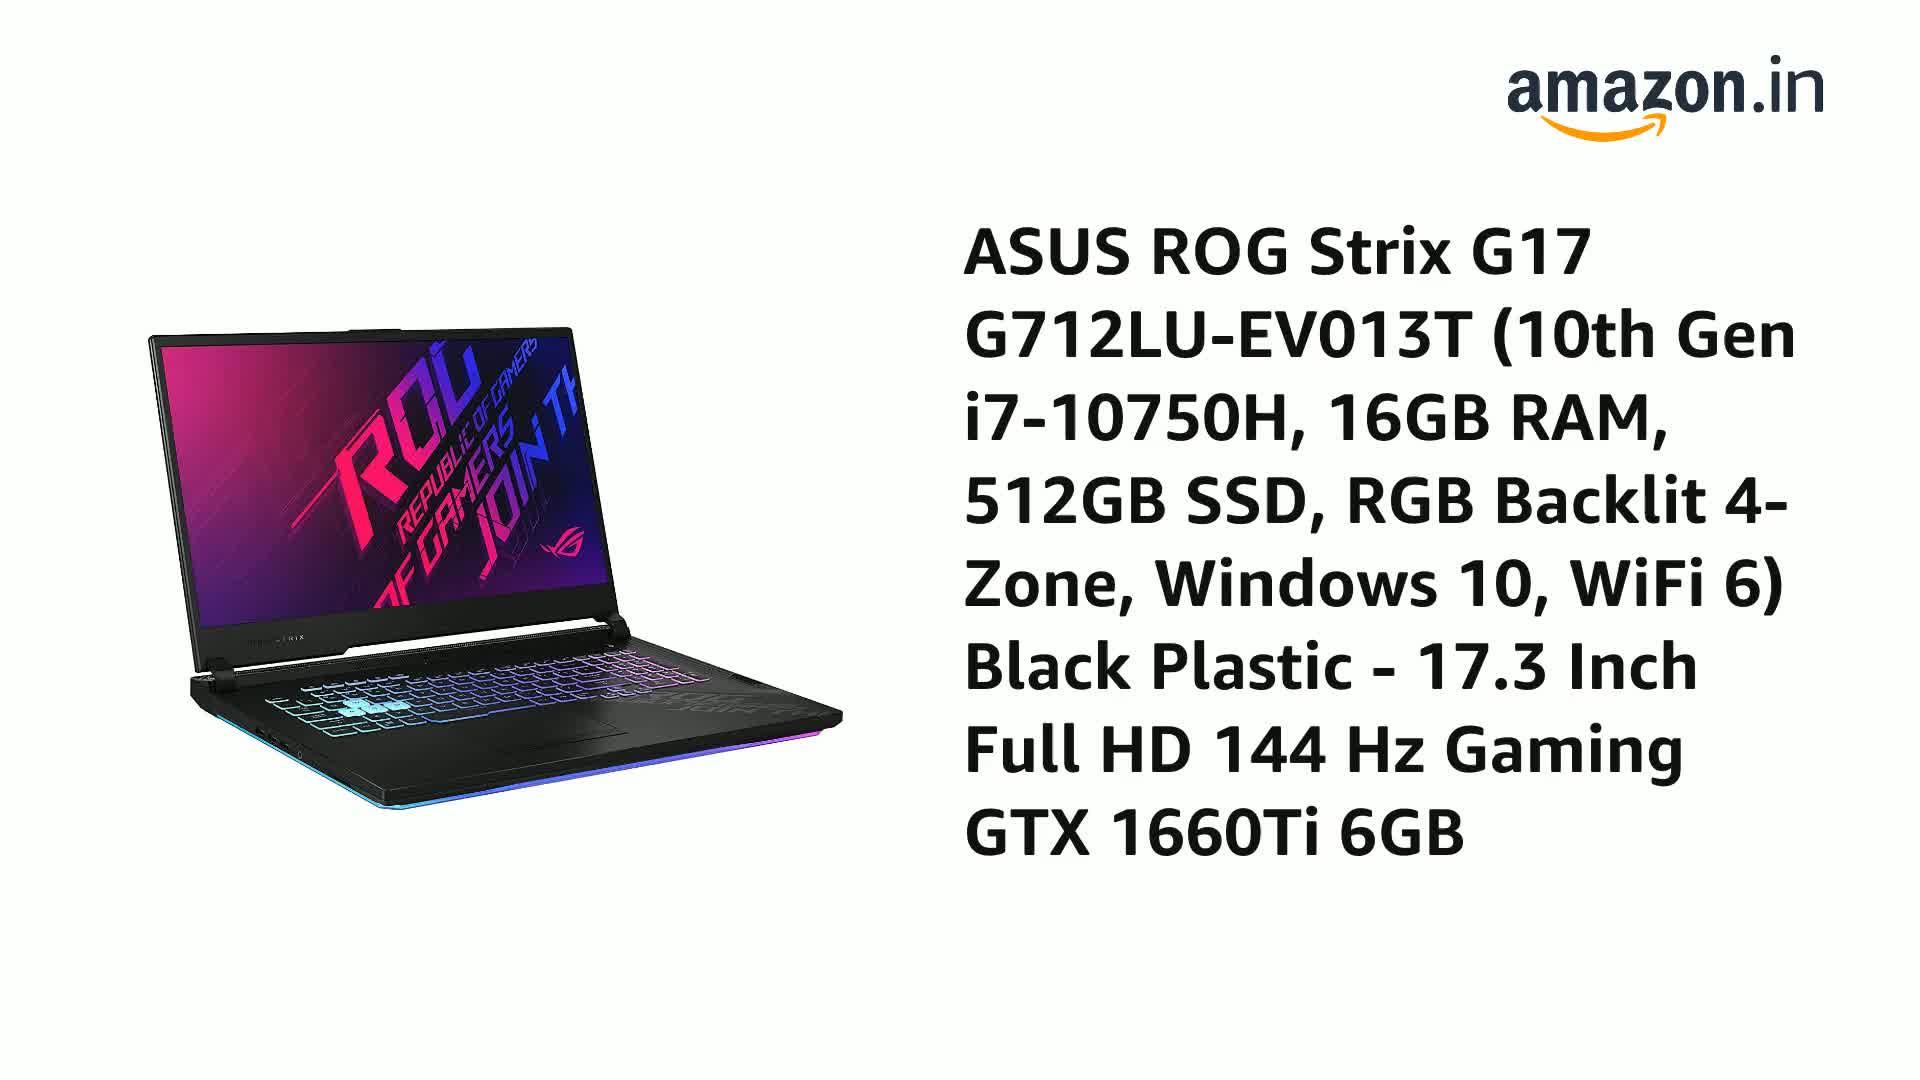 ASUS ROG Strix G17 G712LU-EV013T (10th Gen i7-10750H, 16GB RAM, 512GB SSD, RGB Backlit 4-Zone, Windows 10, WiFi 6) Black Plastic – 17.3 Inch Full HD 144 Hz Gaming GTX 1660Ti 6GB